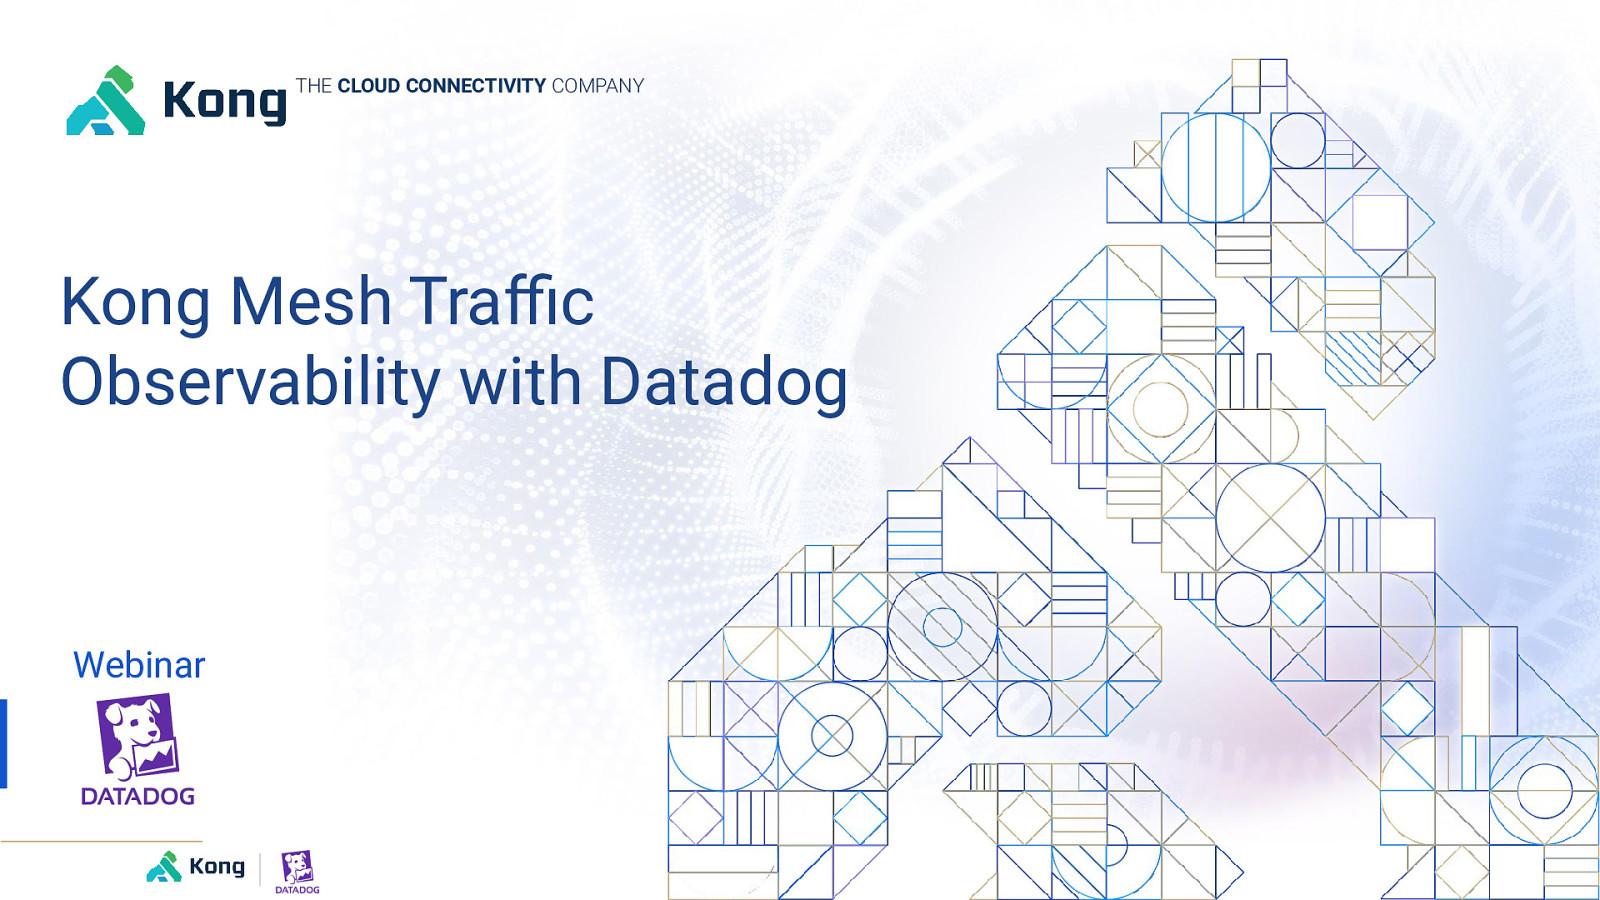 Kong Mesh Traffic Observability with Datadog